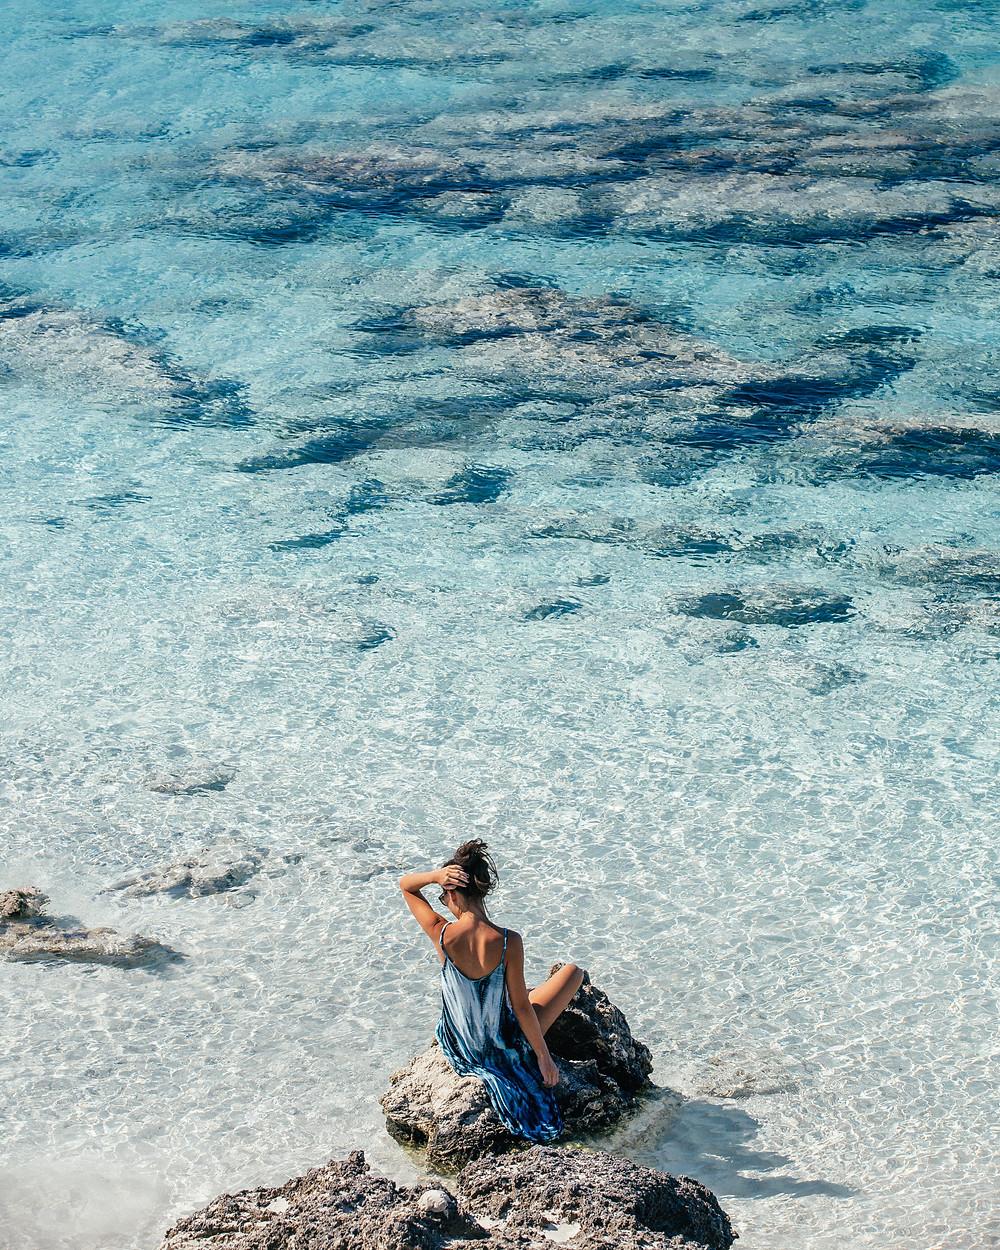 Elafonissi Beach, Crete, Greece